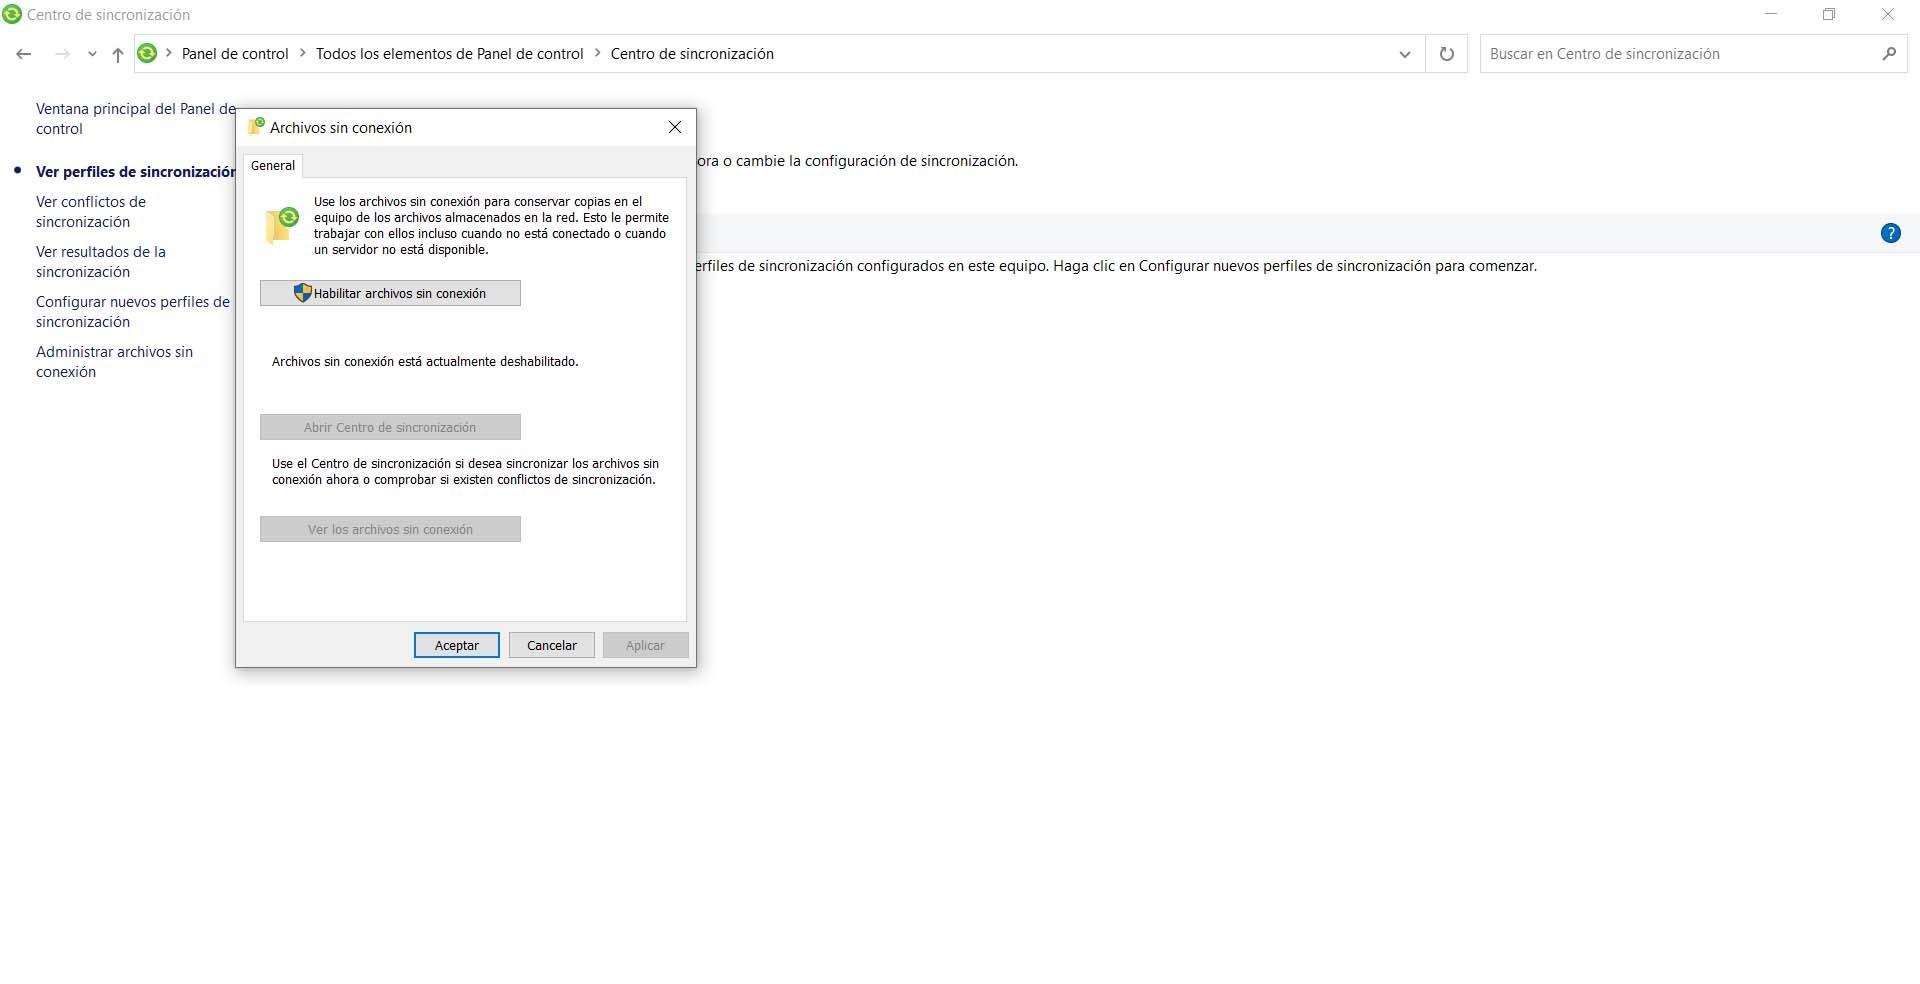 Administrar archivos sin conexión